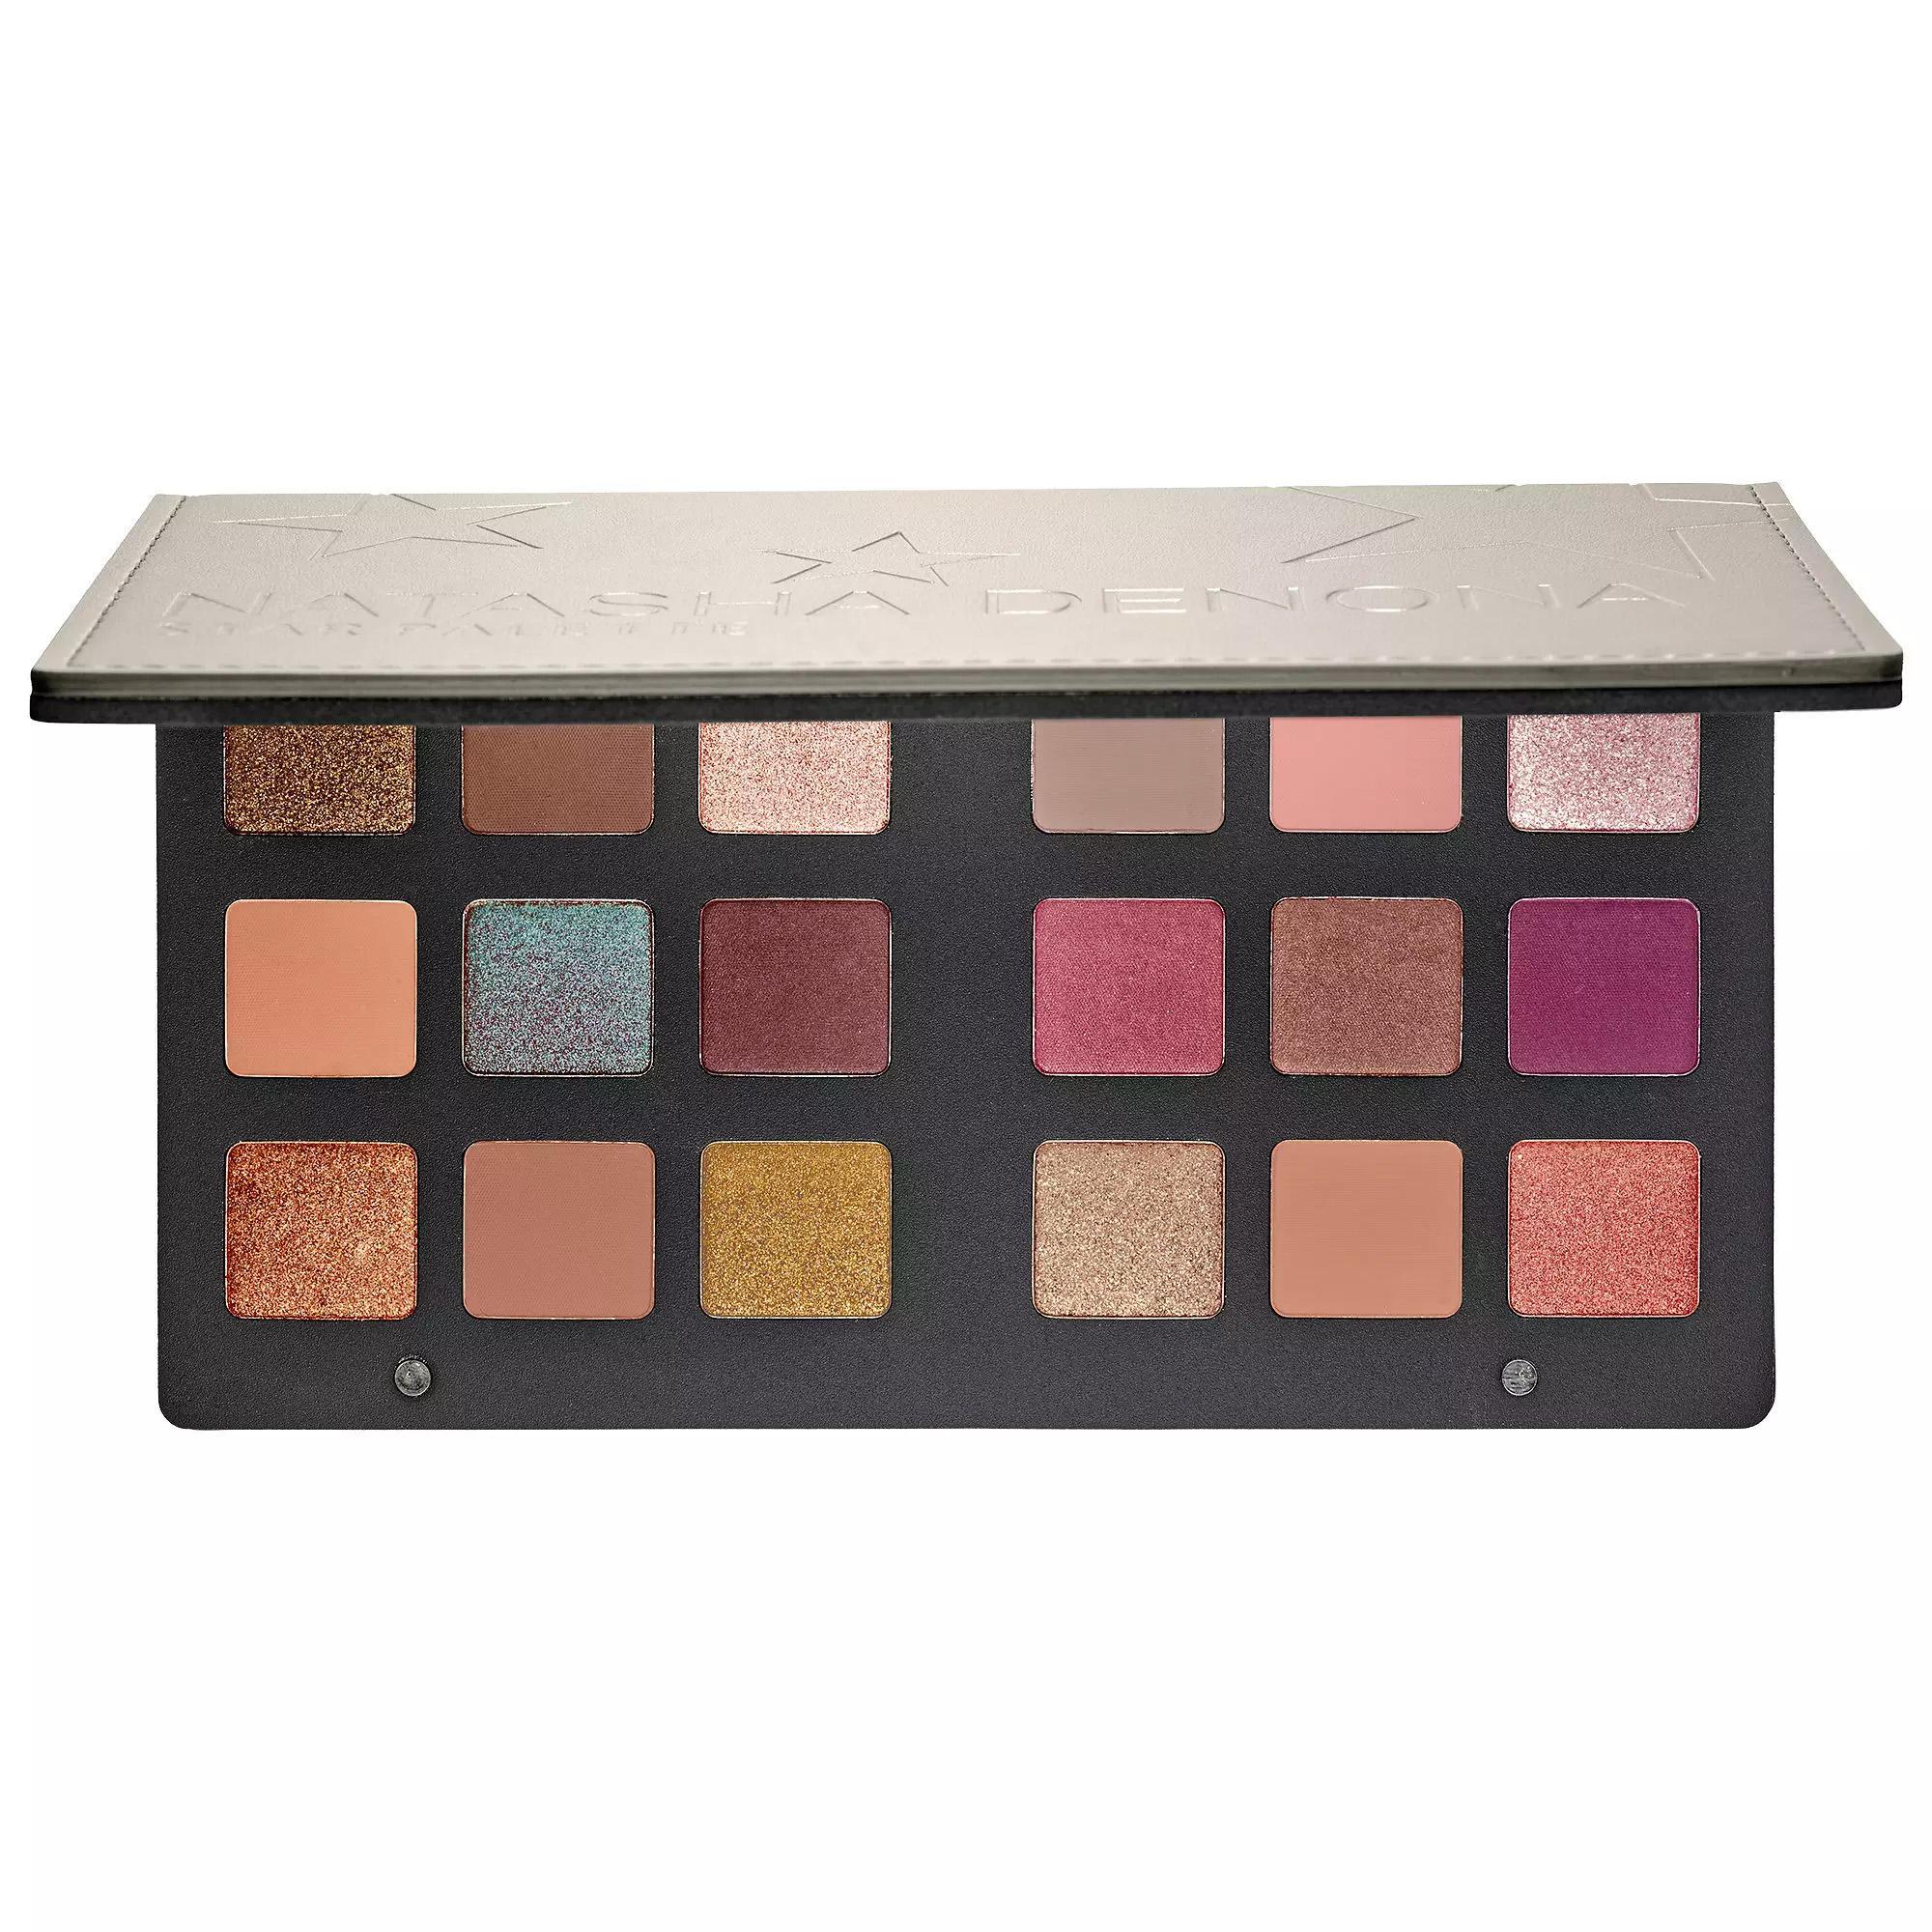 Natasha Denona Star Eyeshadow Palette * missing top right color *